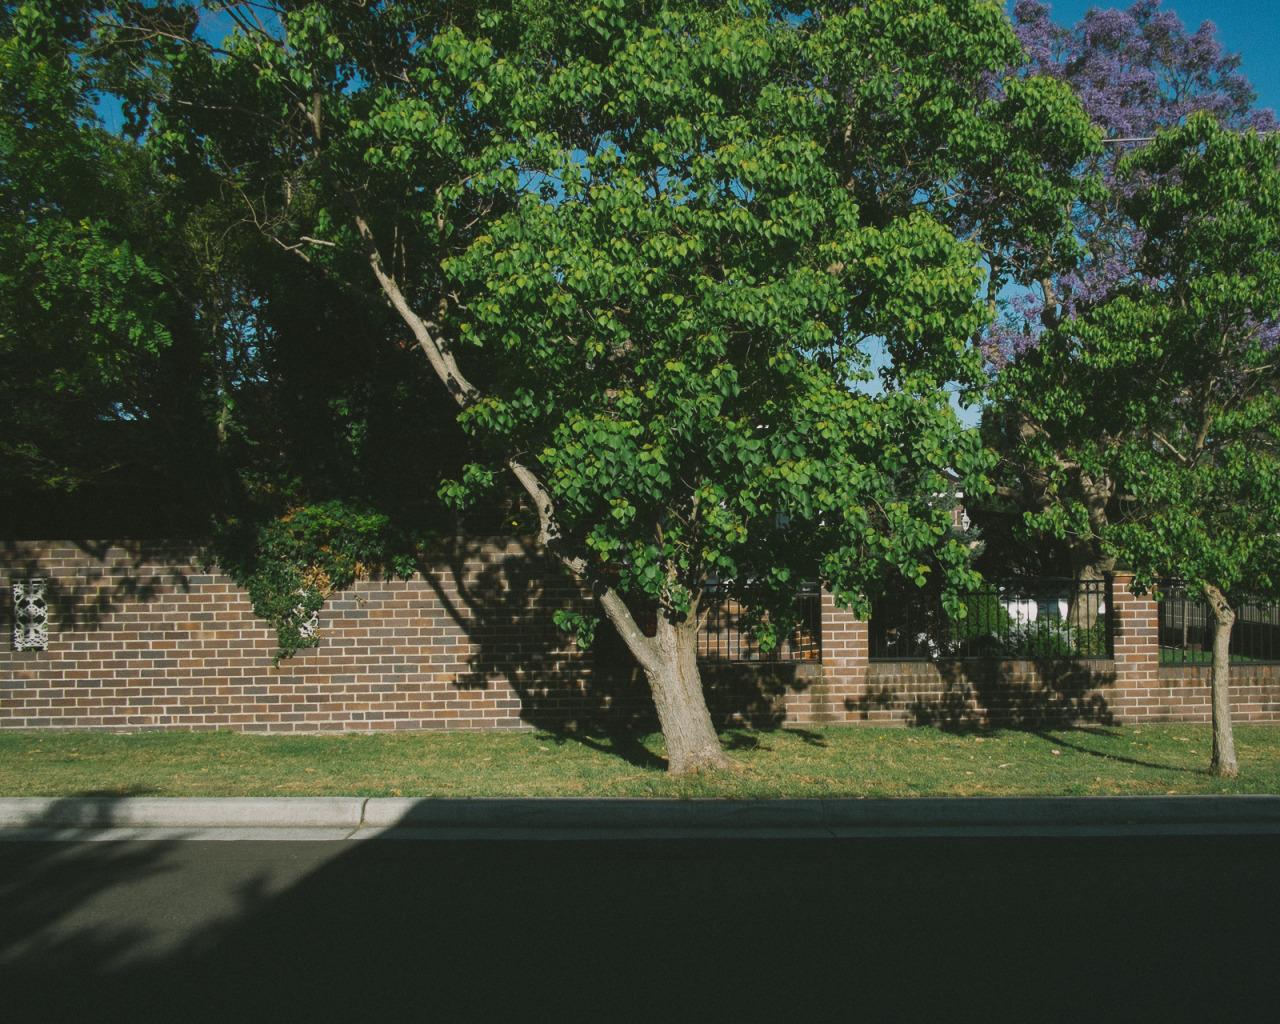 #suburbia #sansSouci #documentingspace